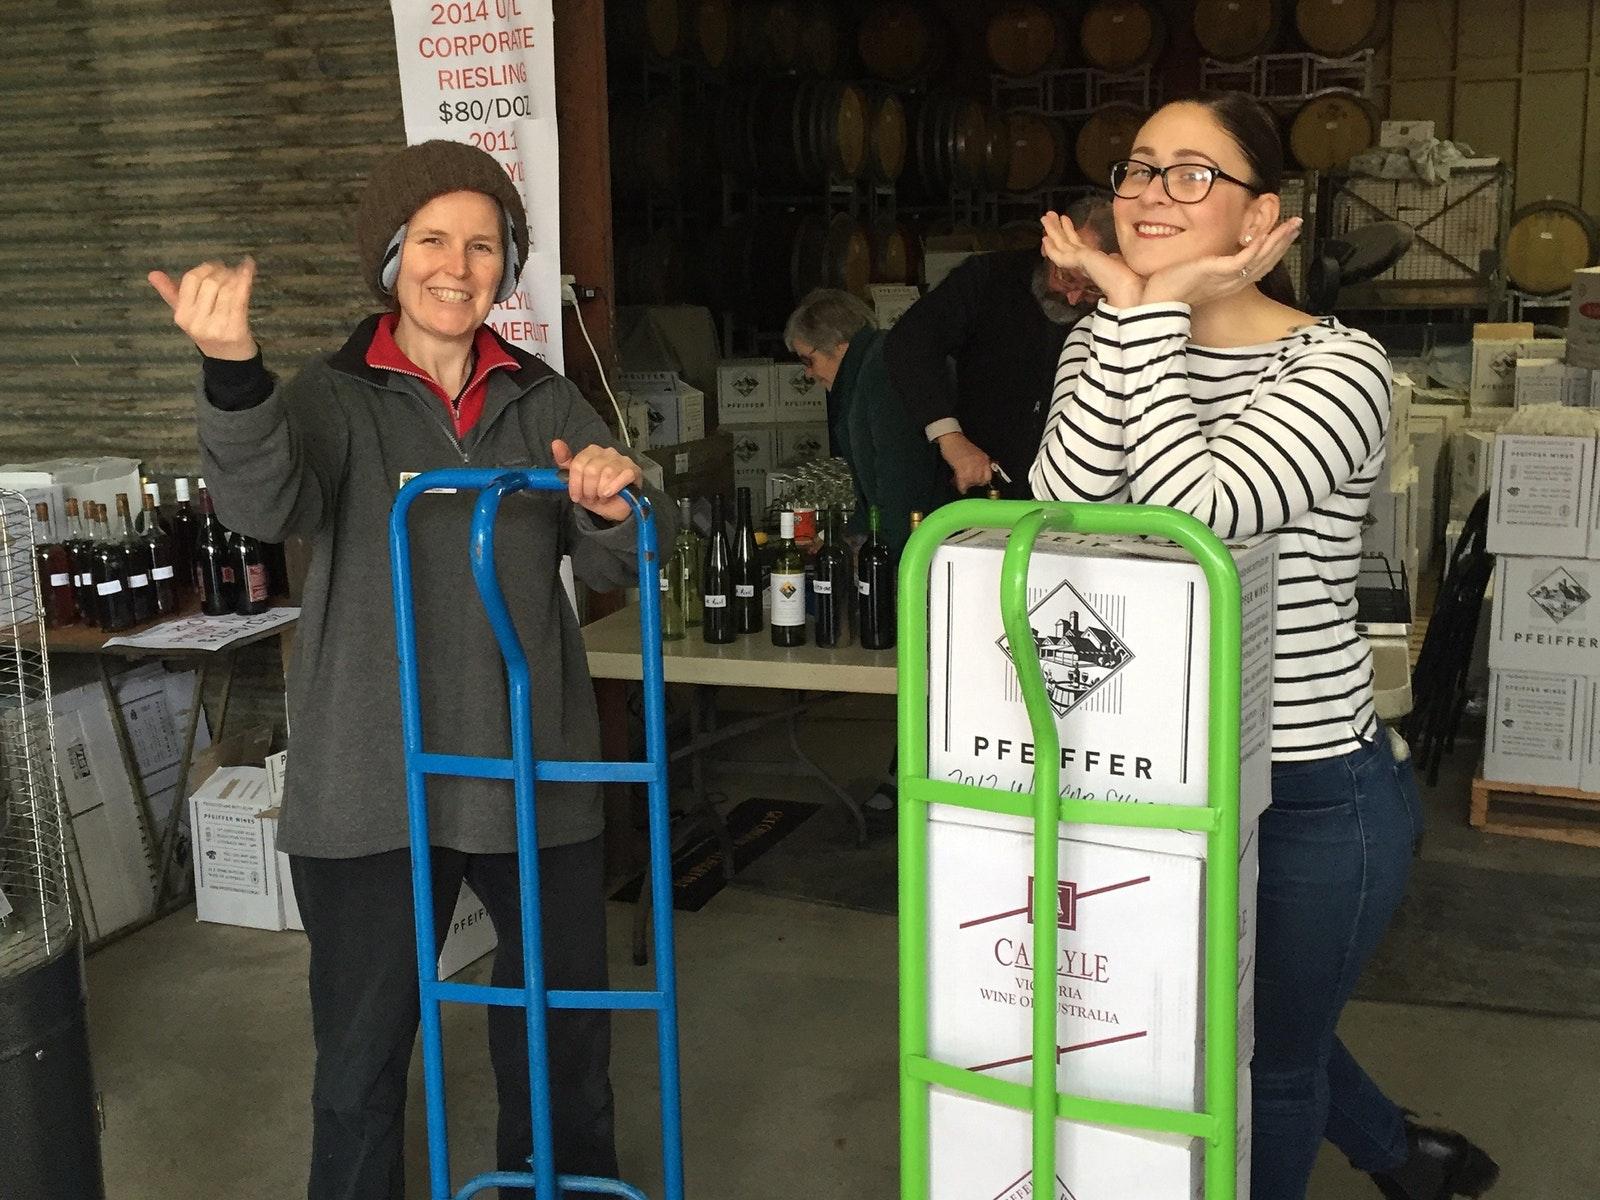 Pfeiffer Wines Rutherglen Giant Warehouse Sale